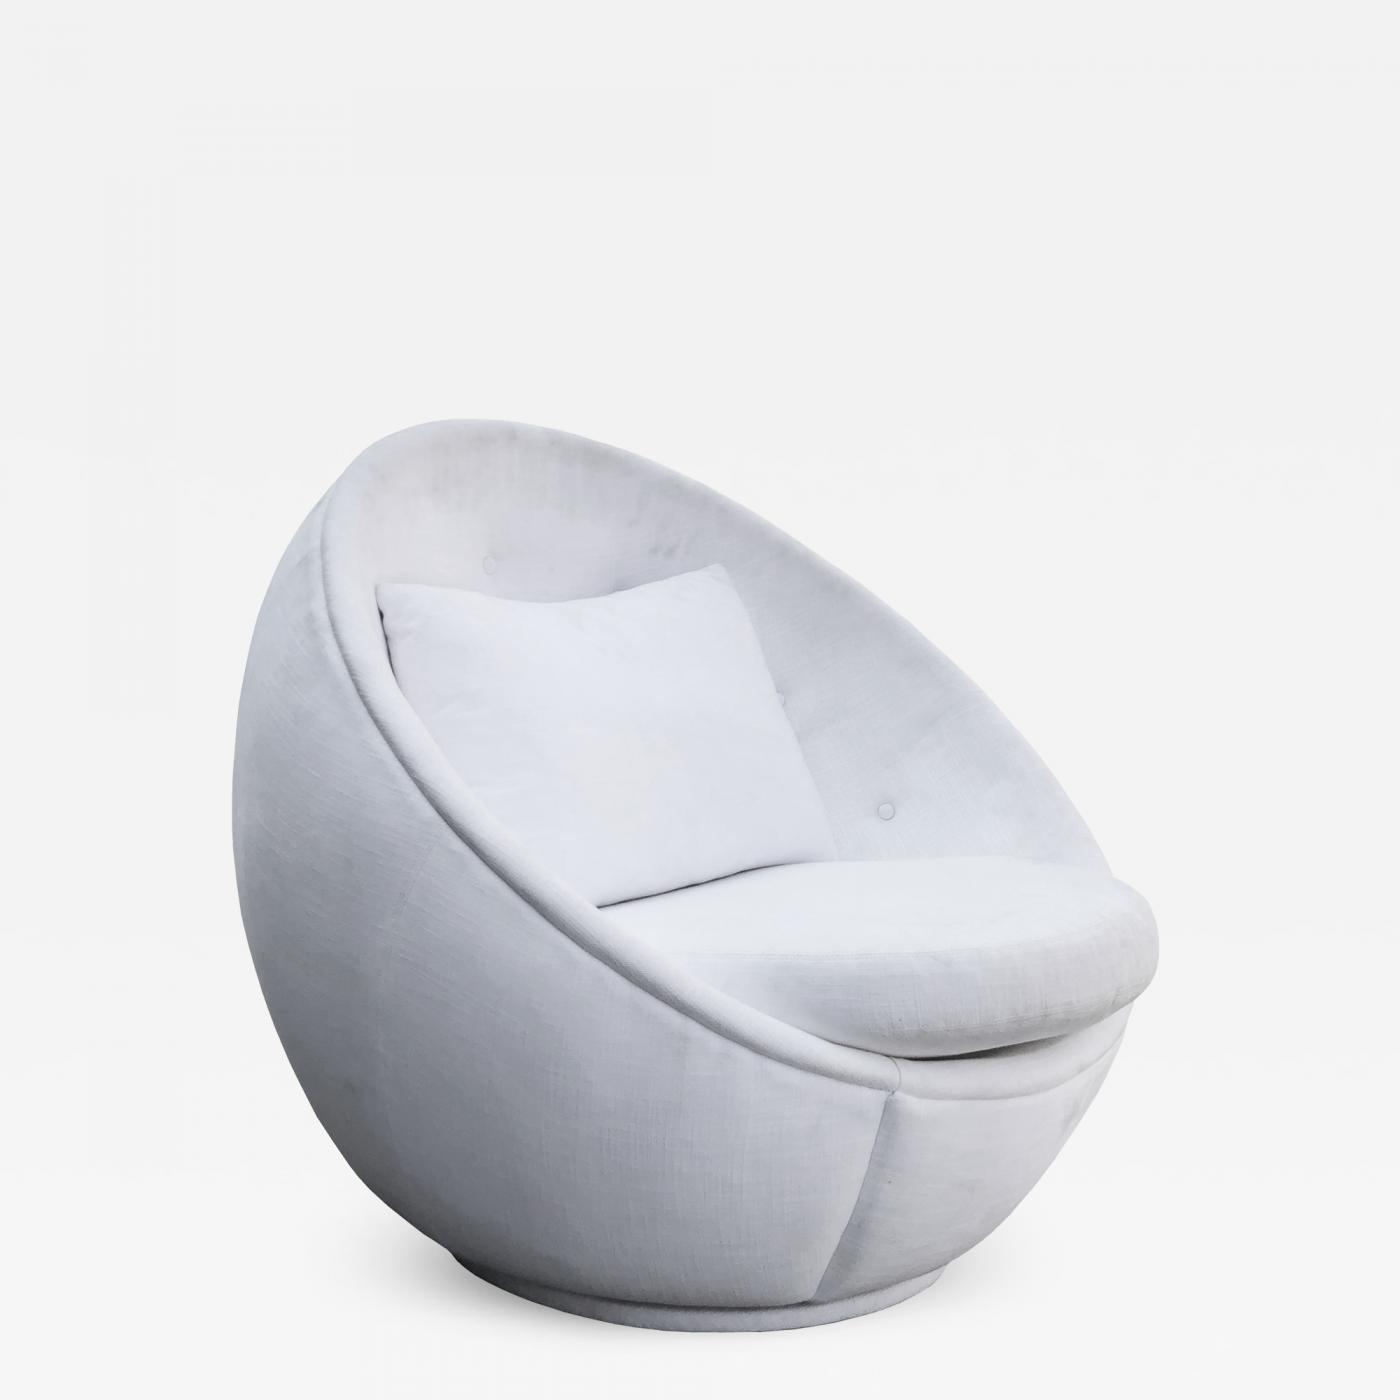 Milo Baughman Stunning Quot Egg Quot Swivel Chair By Milo